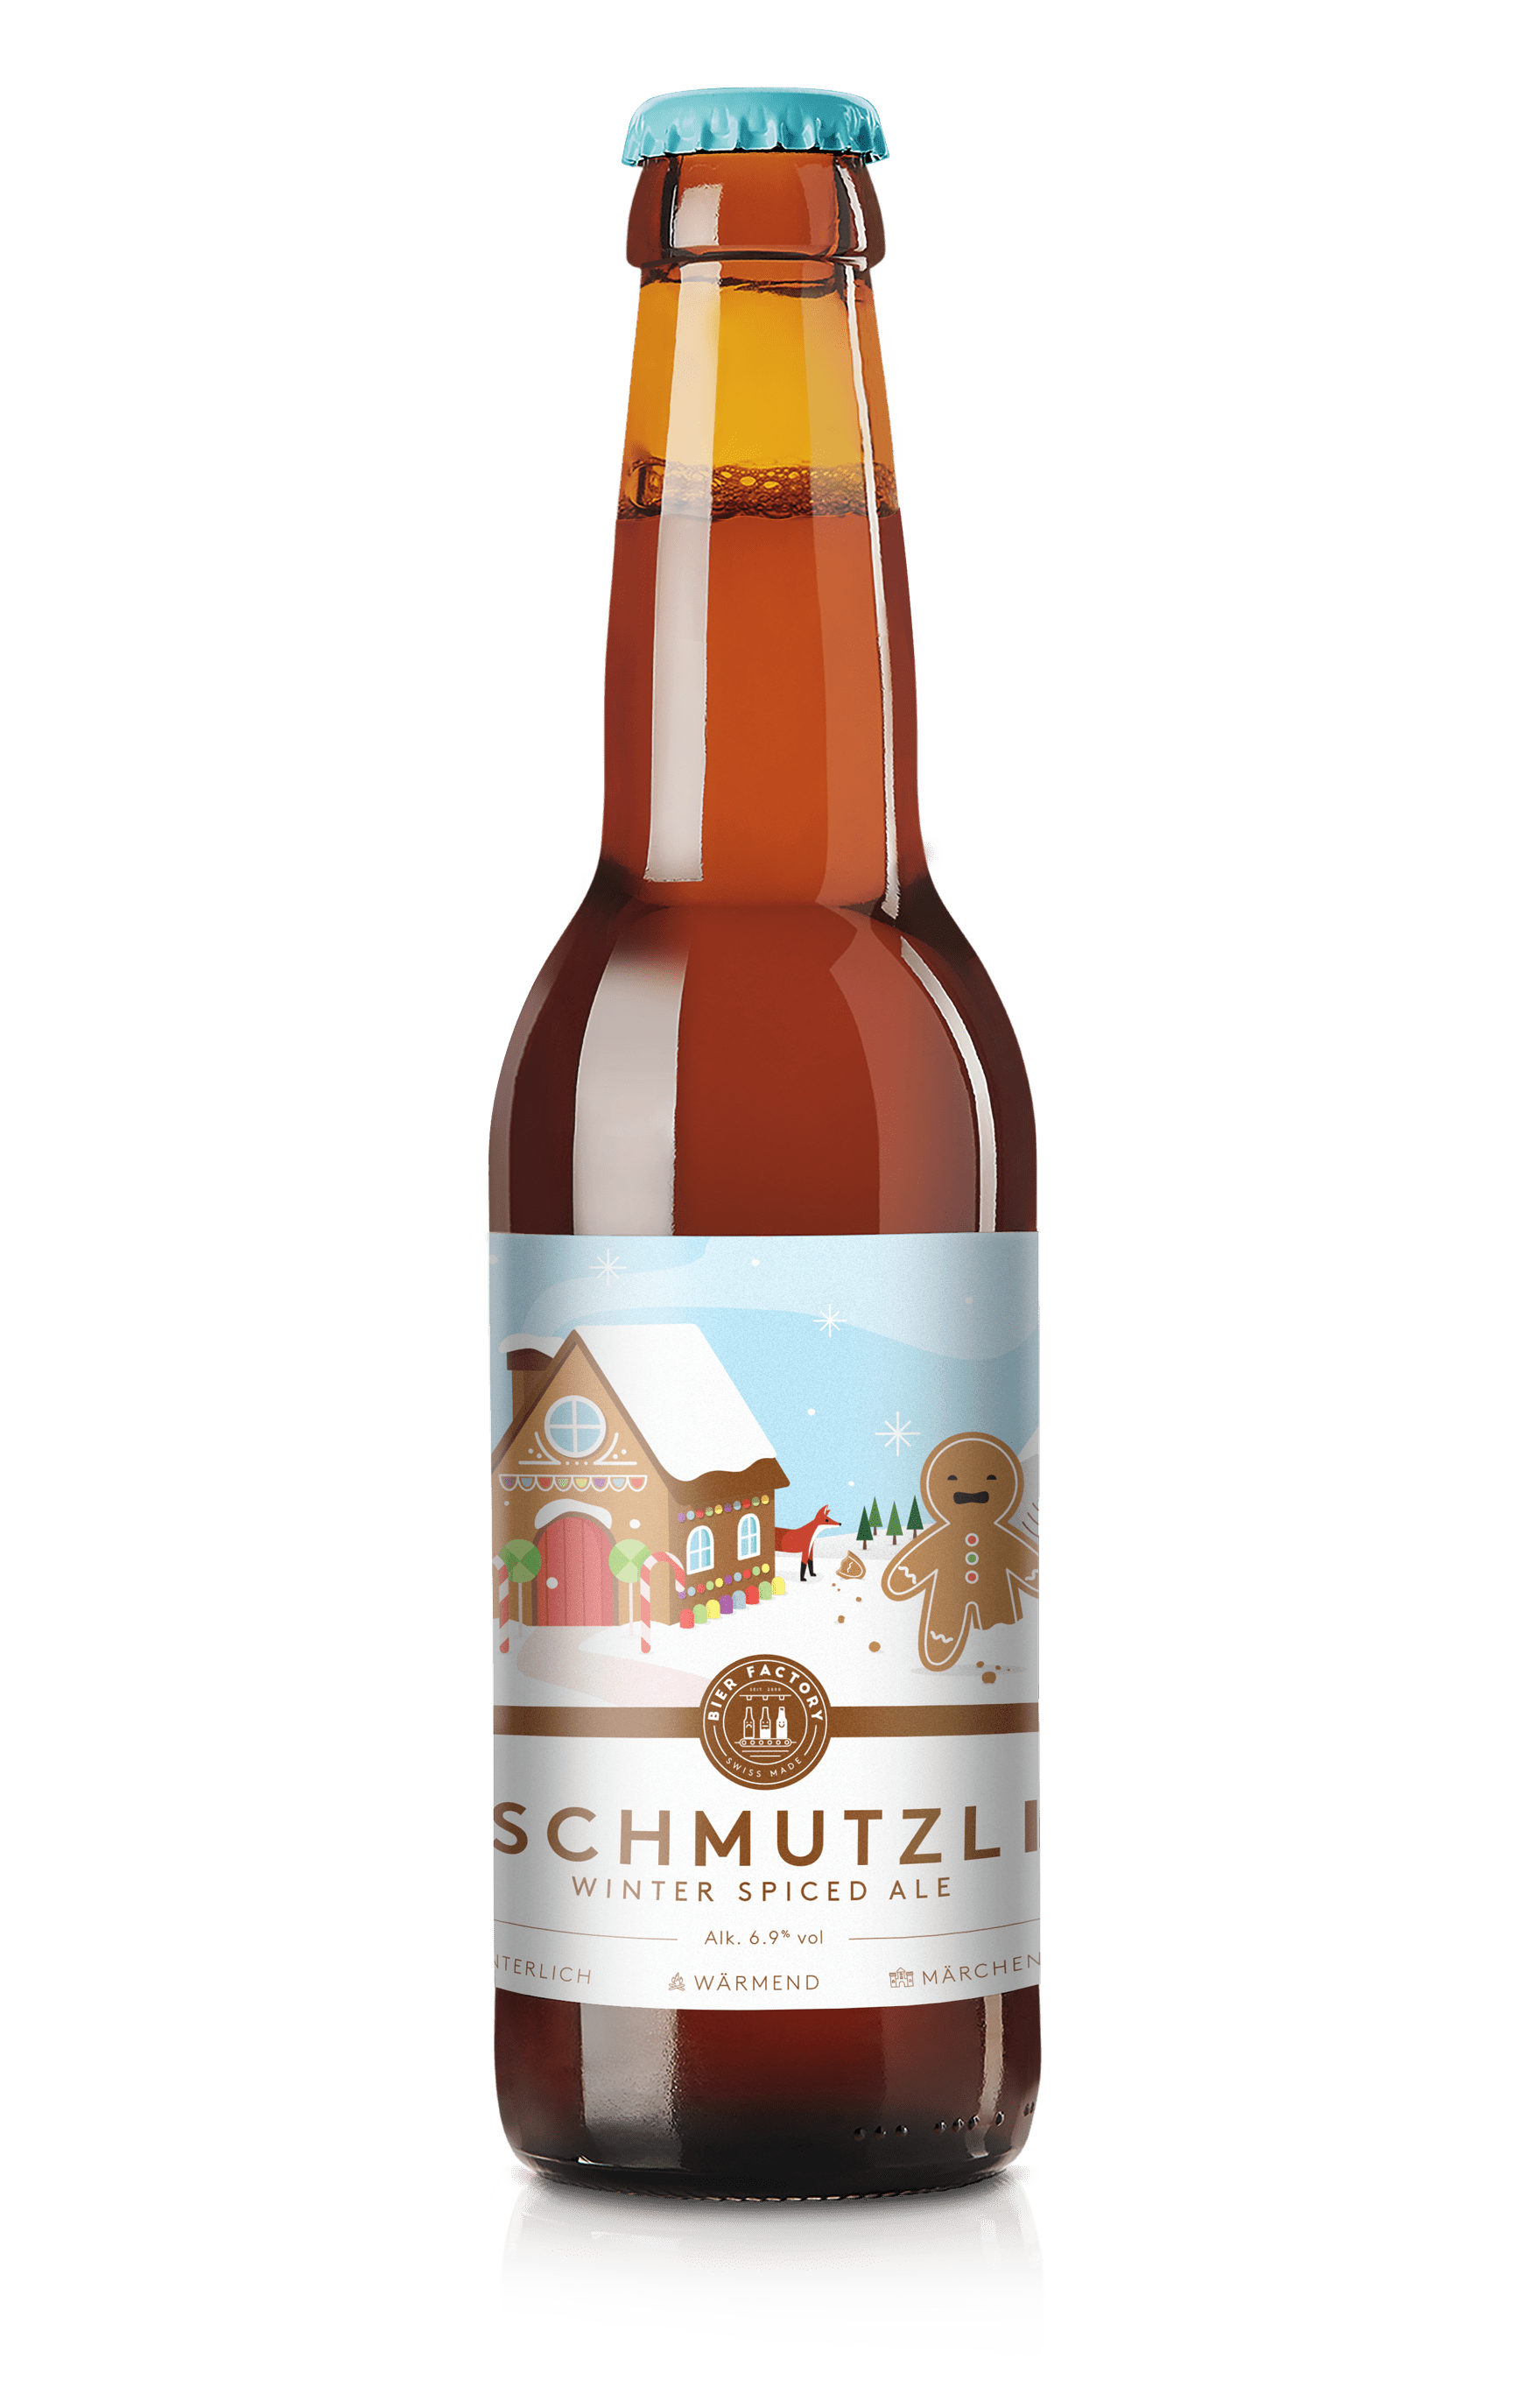 Schmutzli Winter Spiced Ale